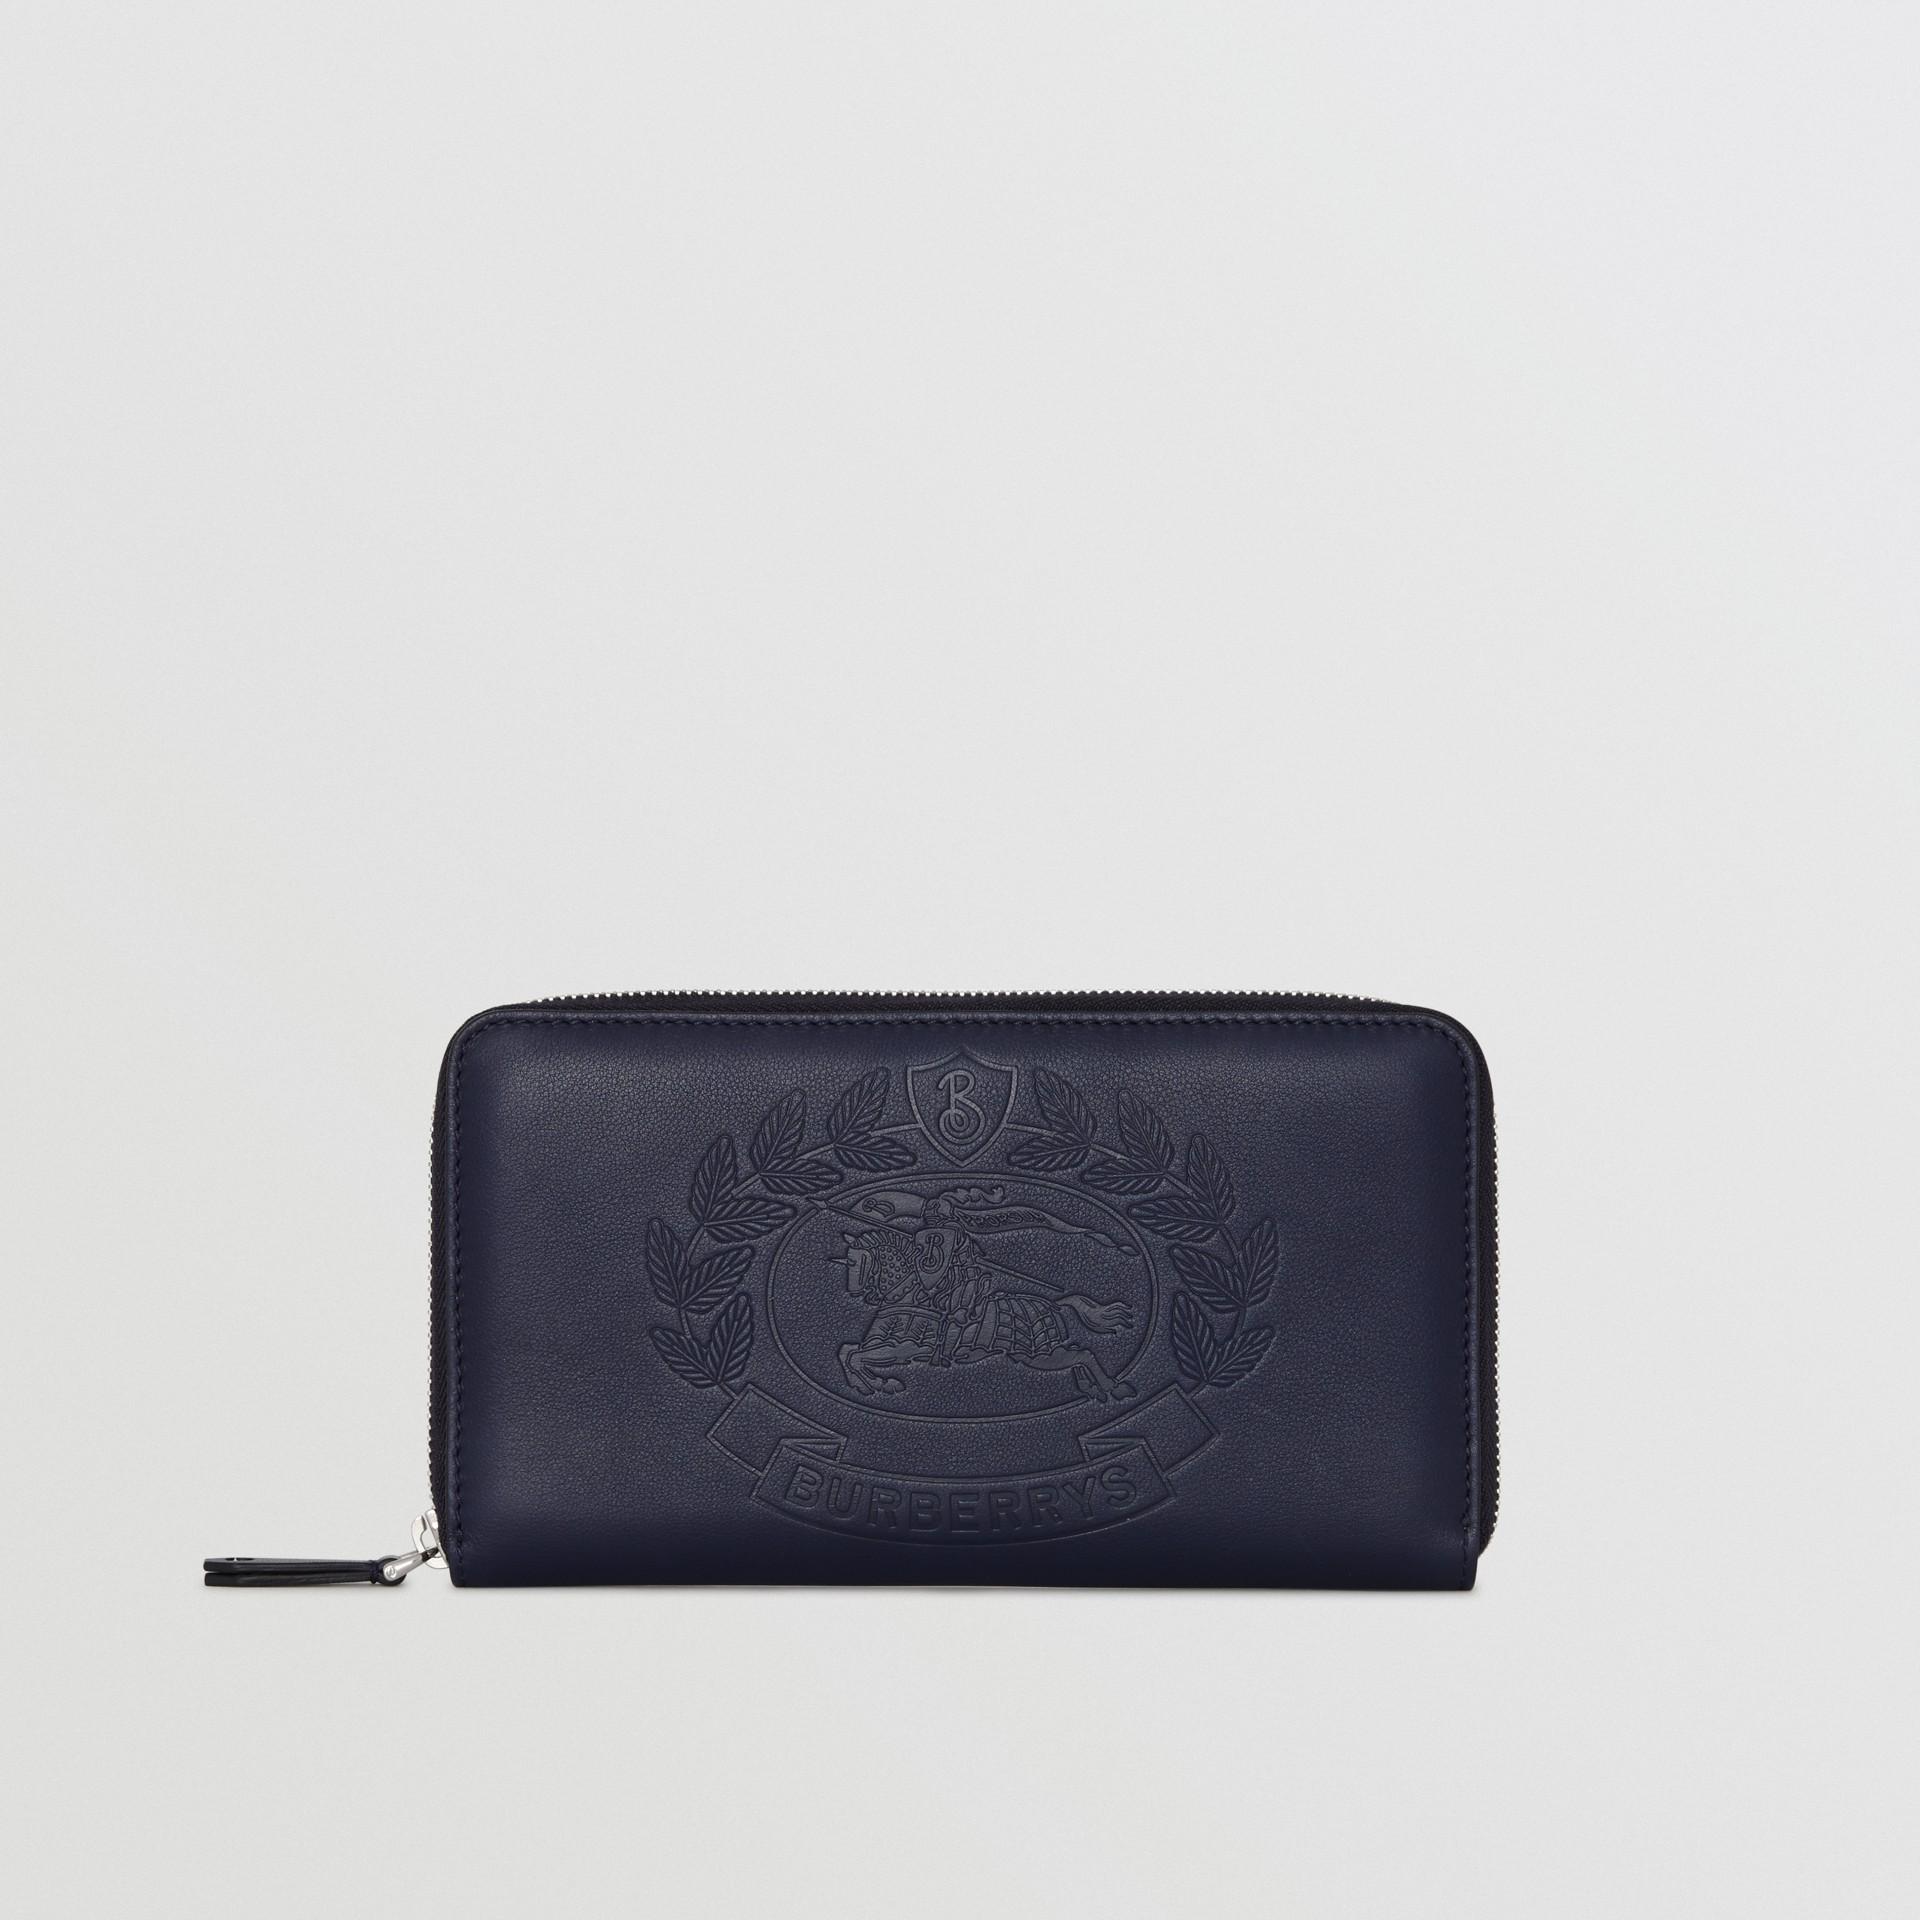 Embossed Crest Leather Ziparound Wallet in Regency Blue - Men | Burberry Australia - gallery image 2